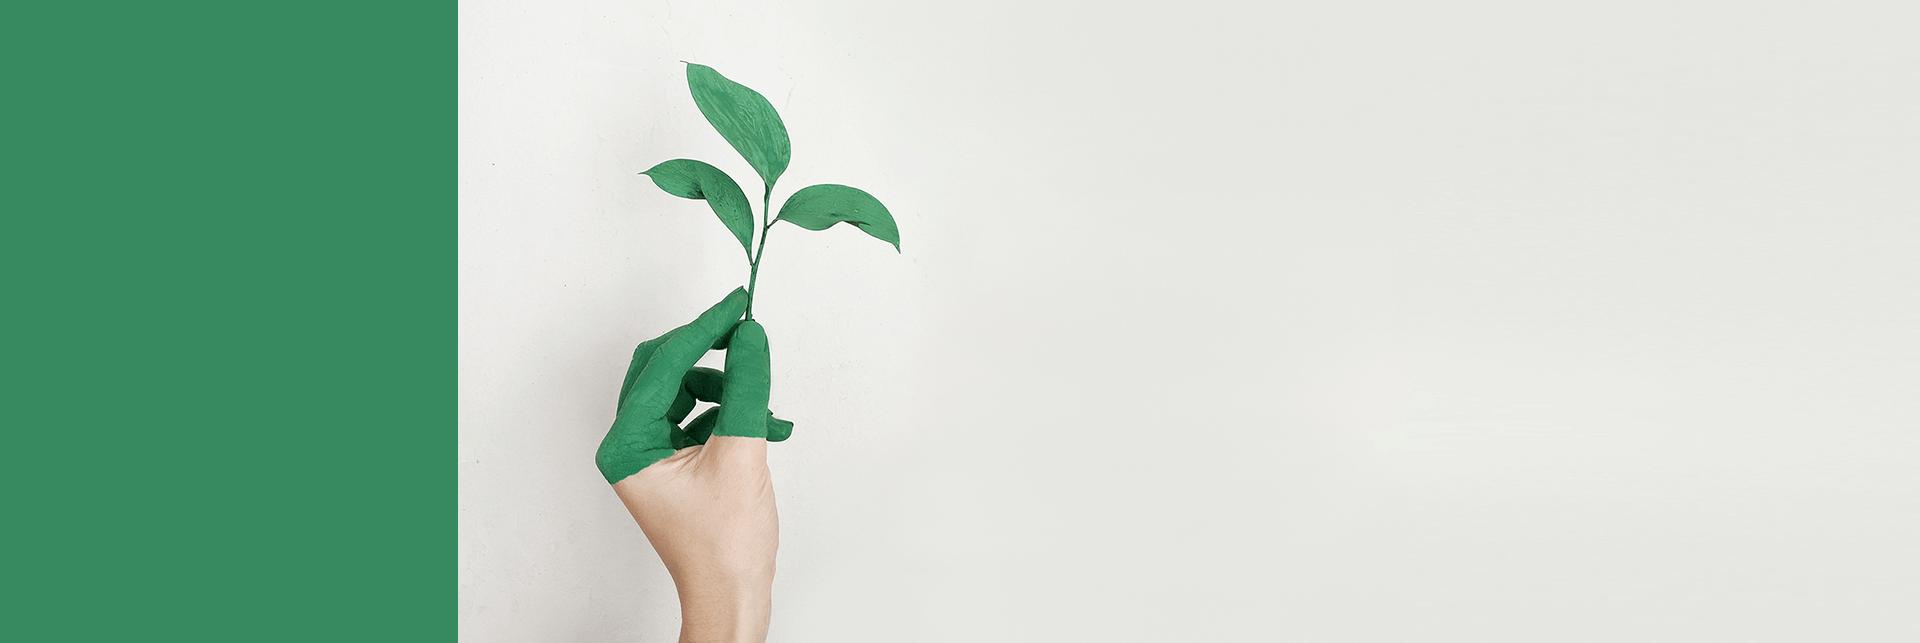 Driving innovation-led sustainability